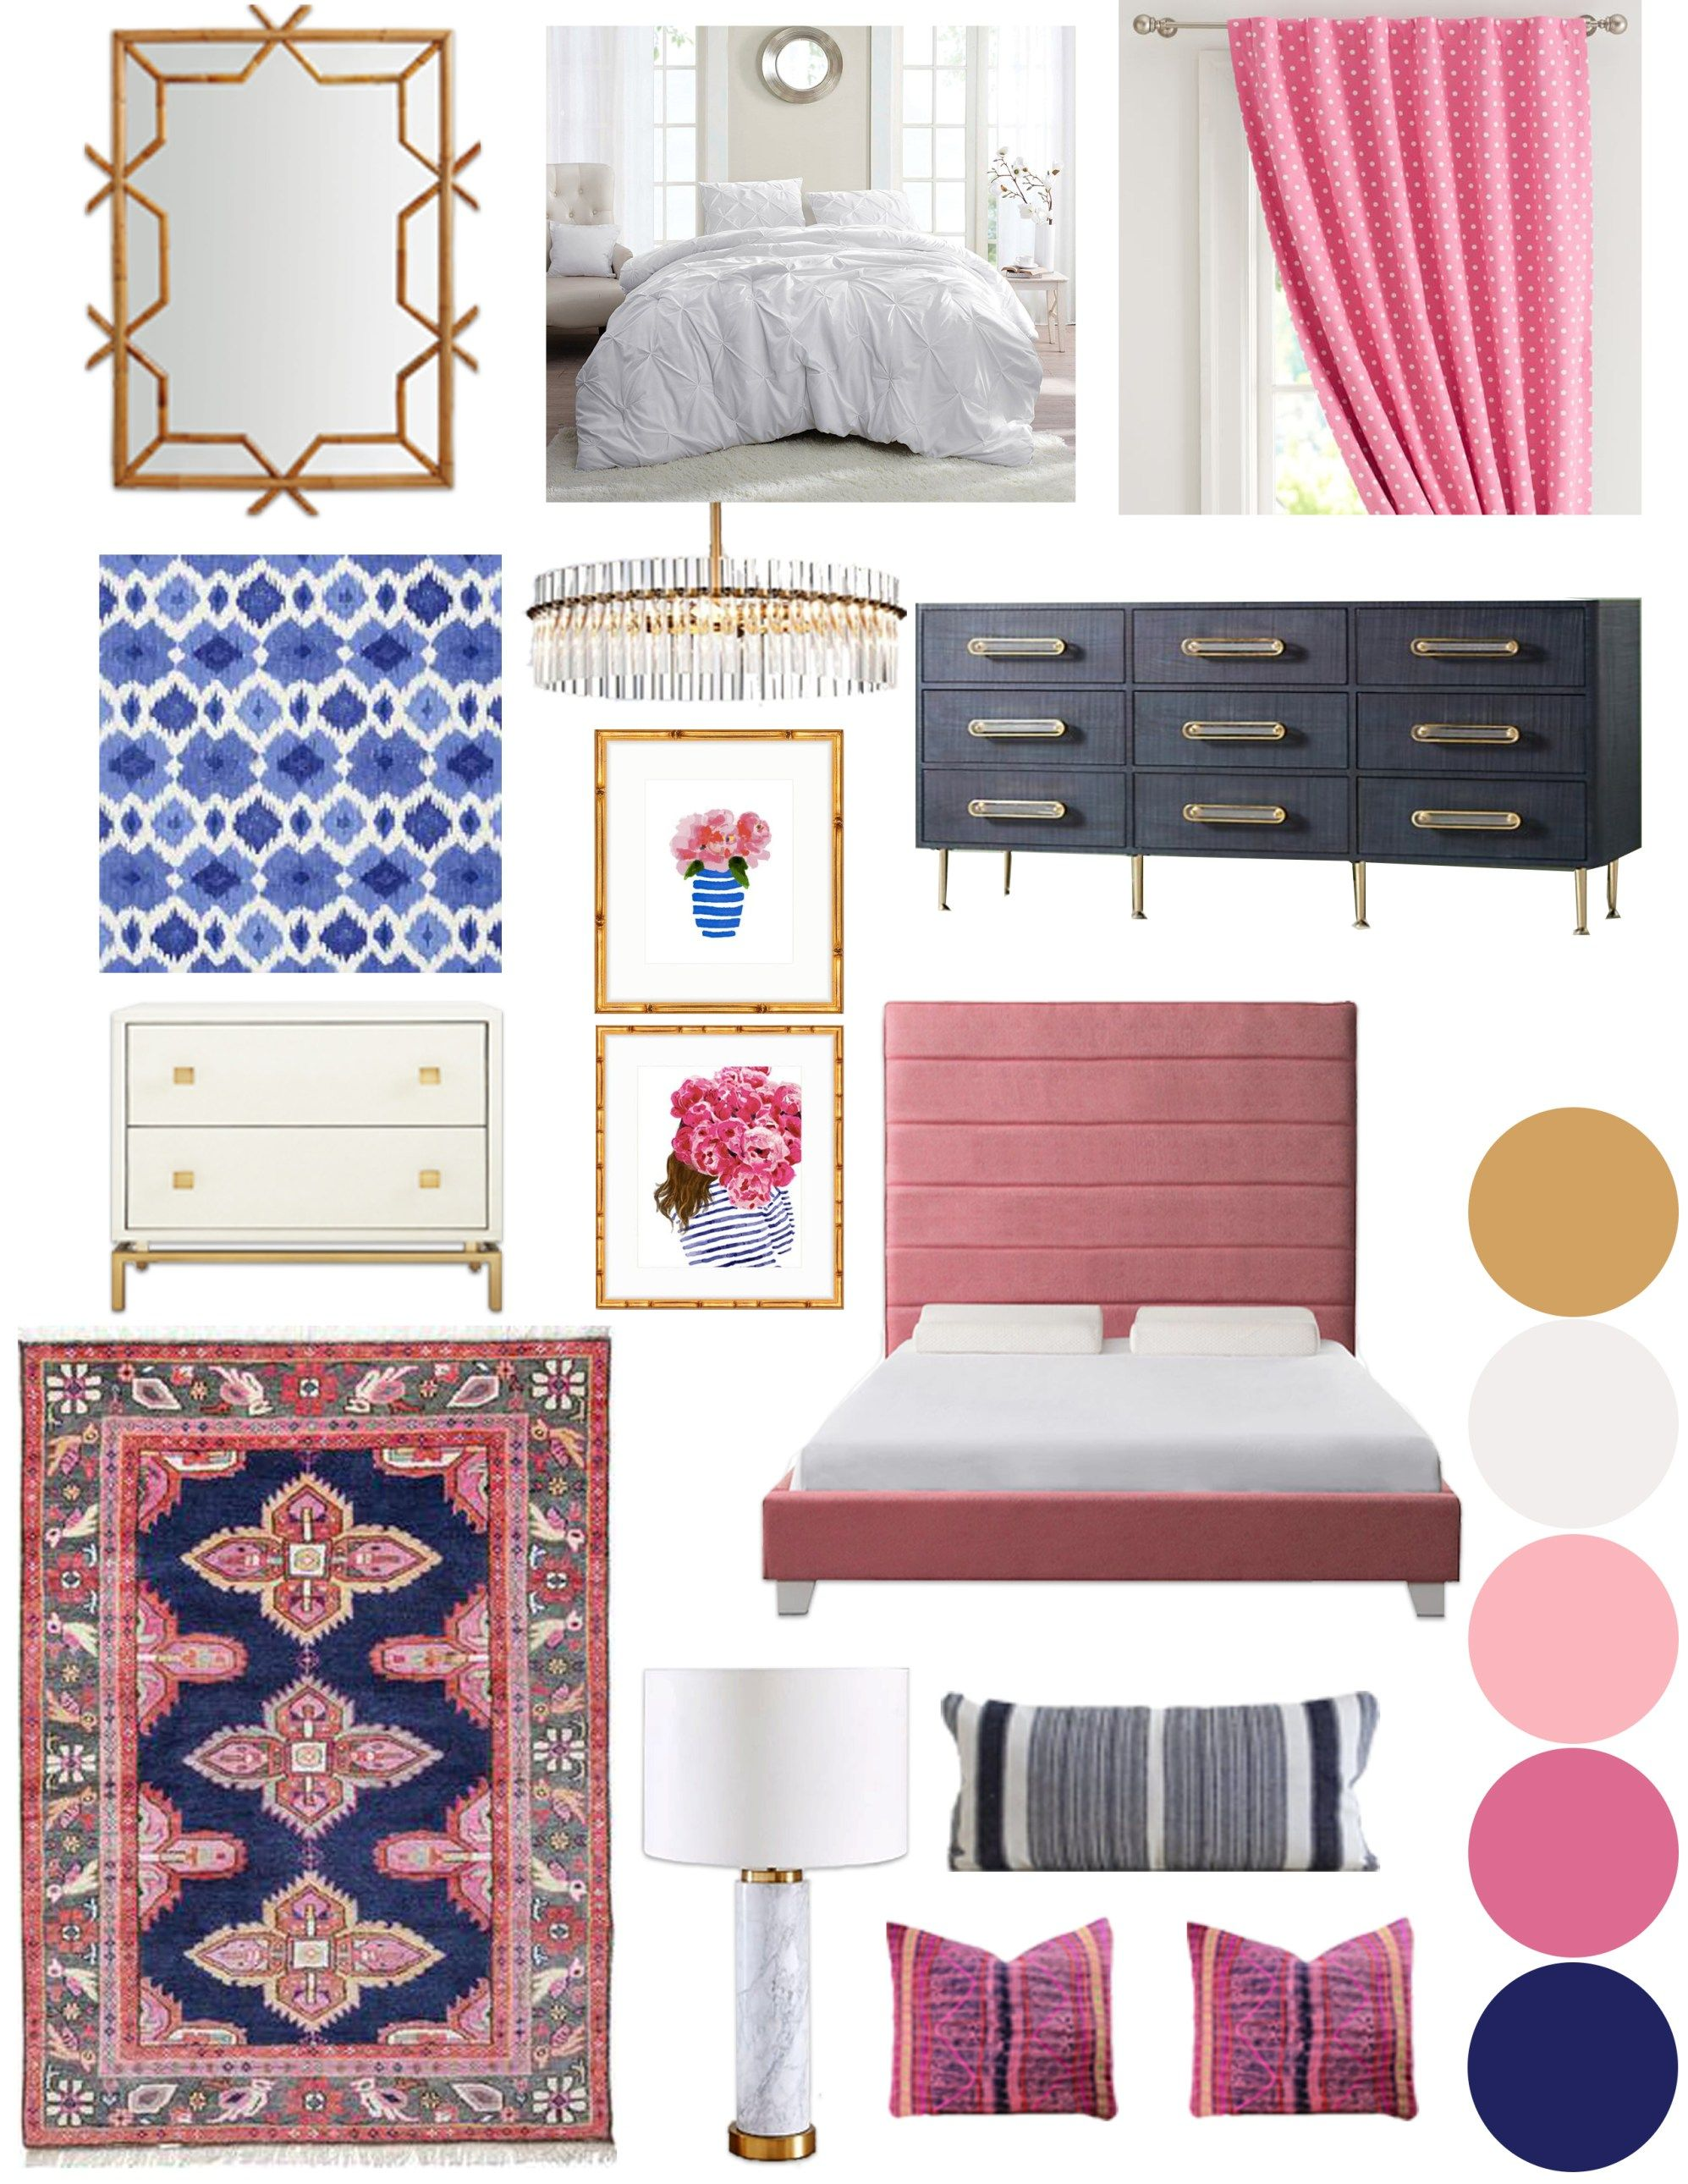 Preppy Boho Glam Bedroom eDesign images